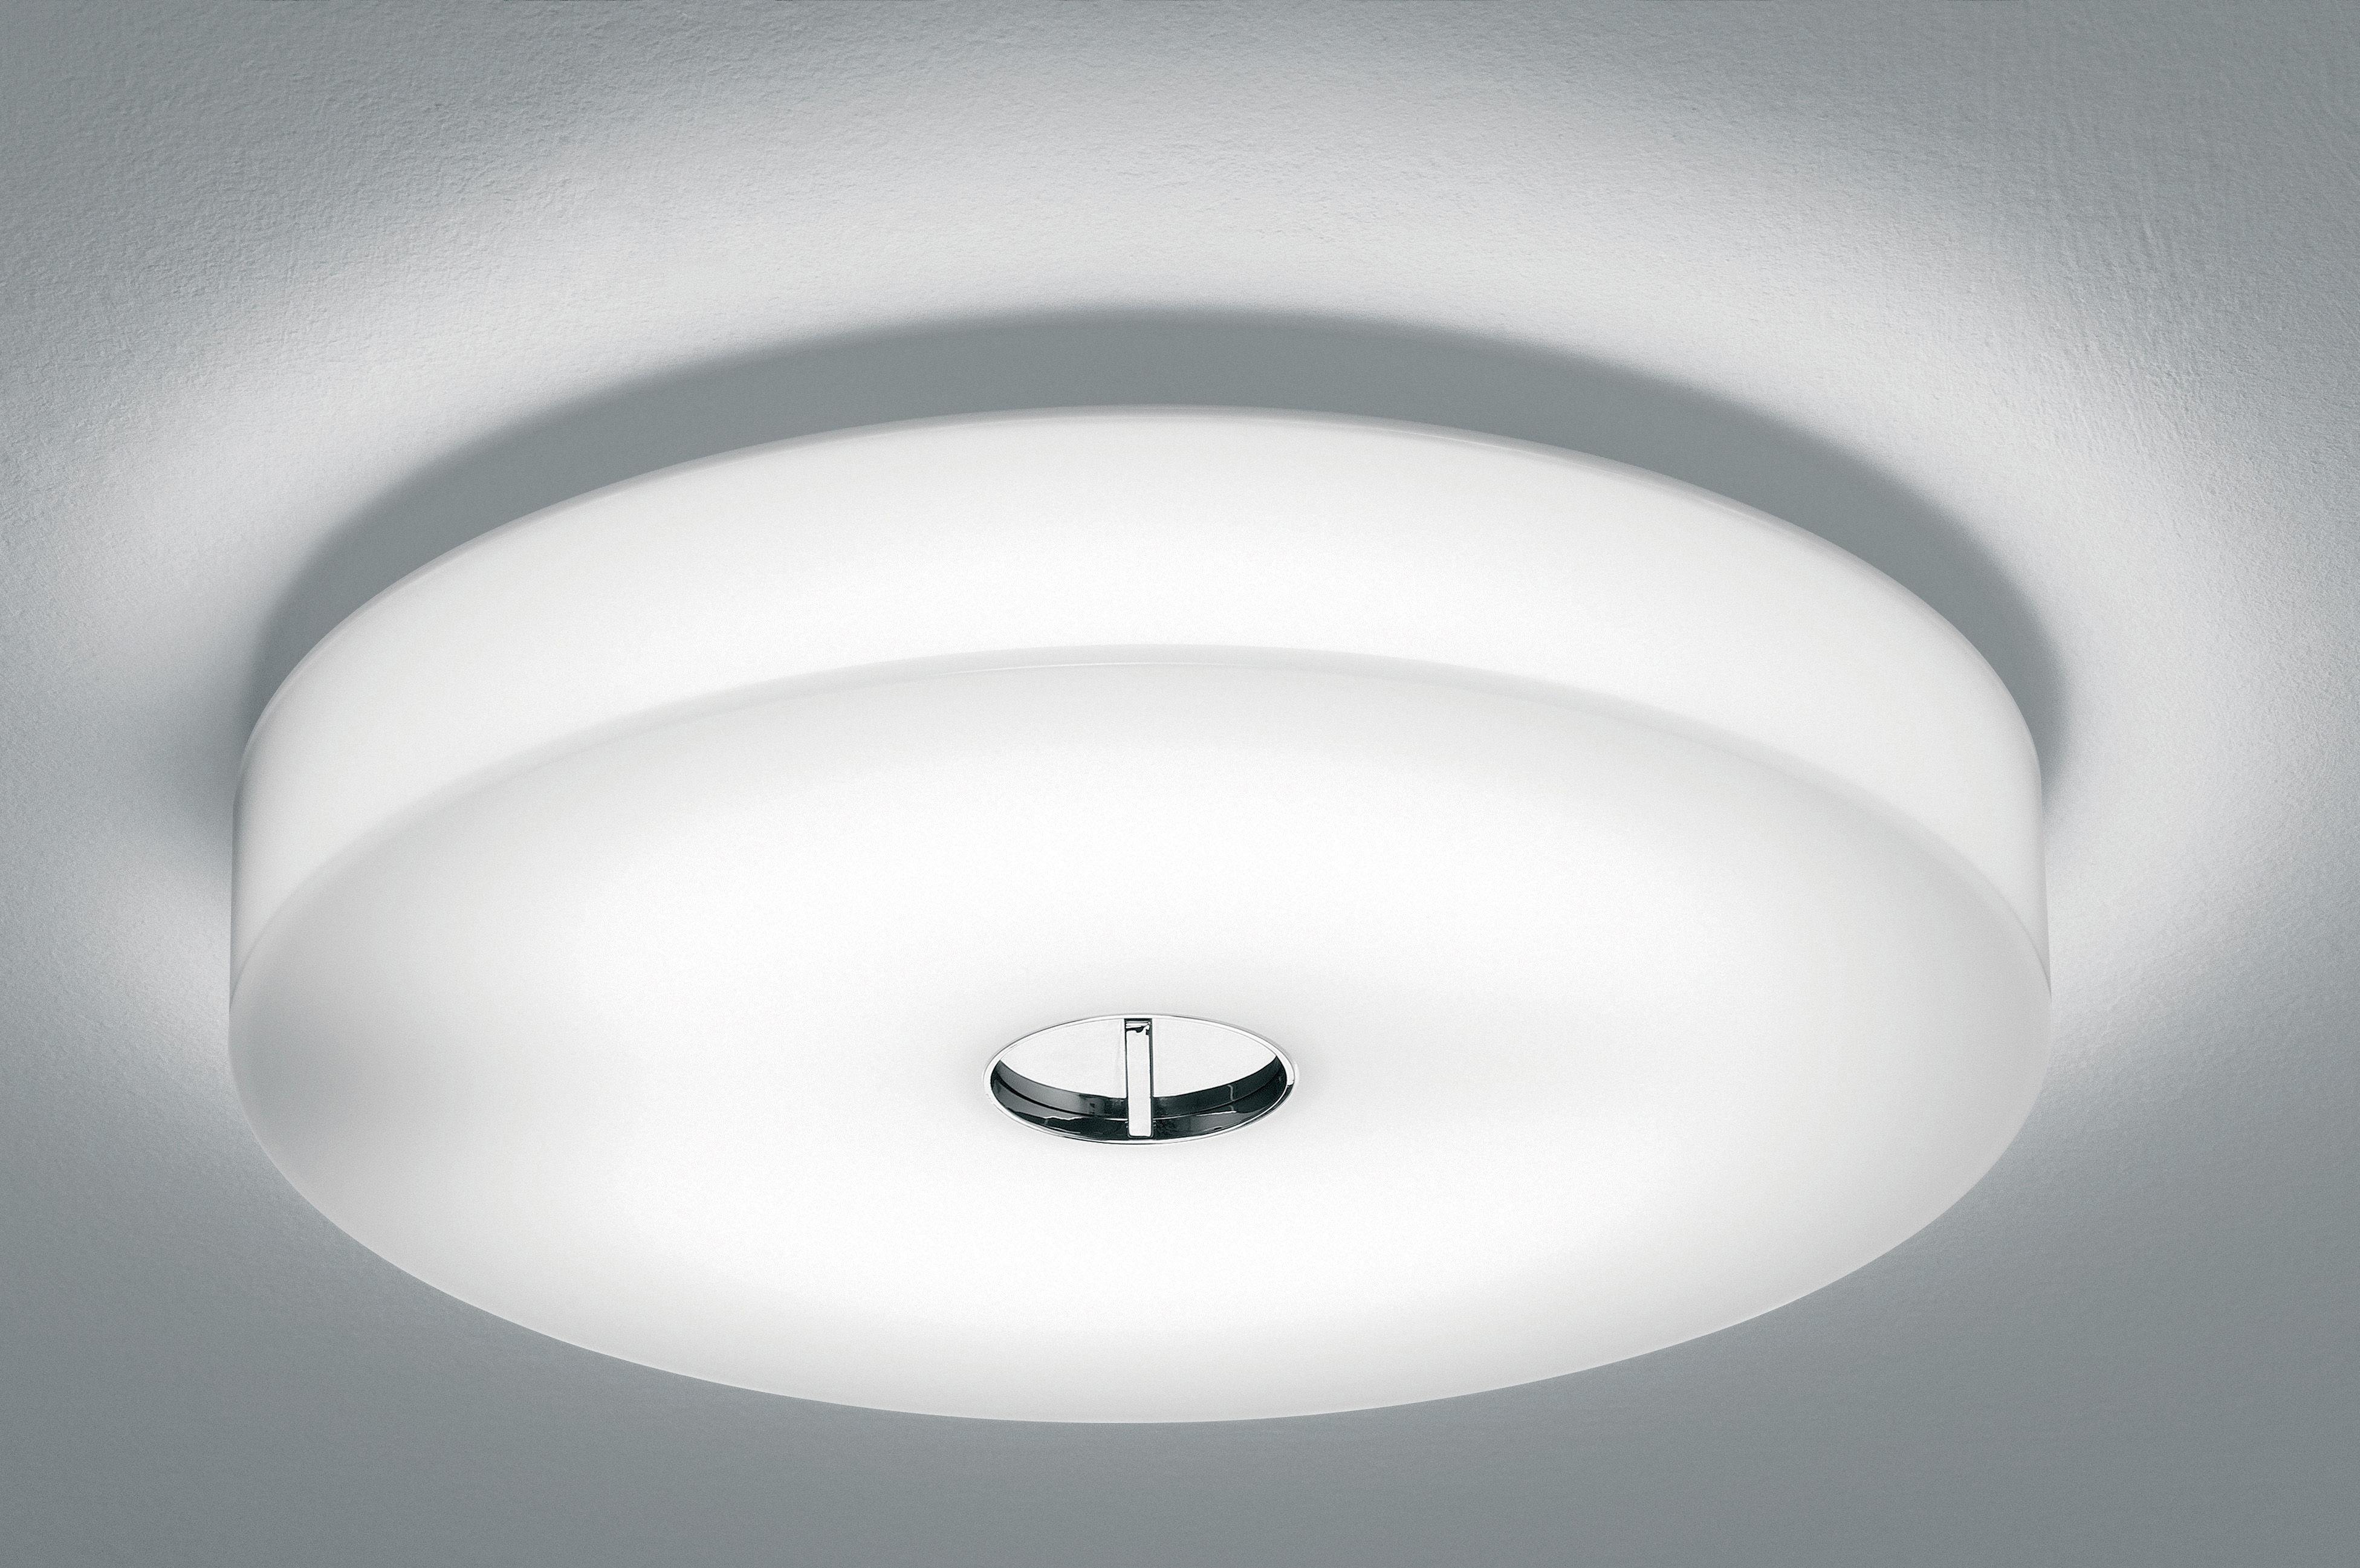 Applique desterno button flos vetro bianco h 8 x Ø 47 made in